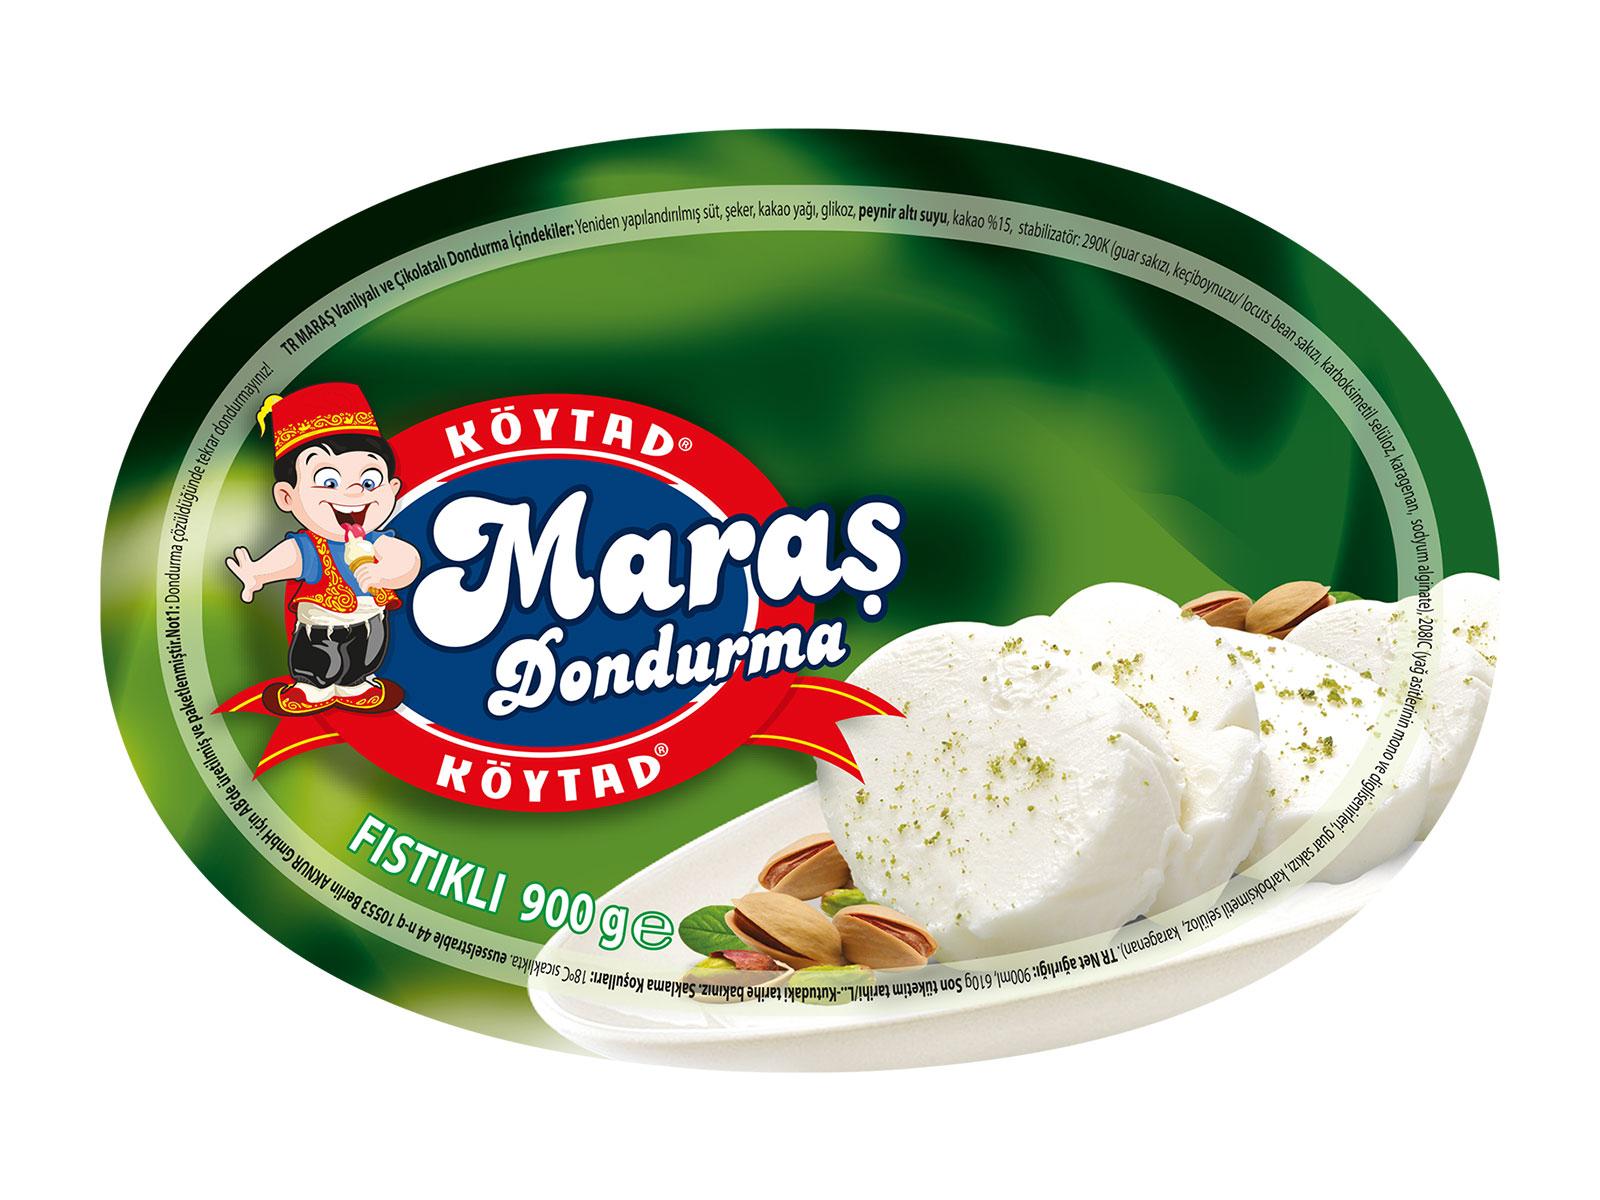 Koytad-Maras-Dondurma-Antep-Fistikli-Vanilya-2